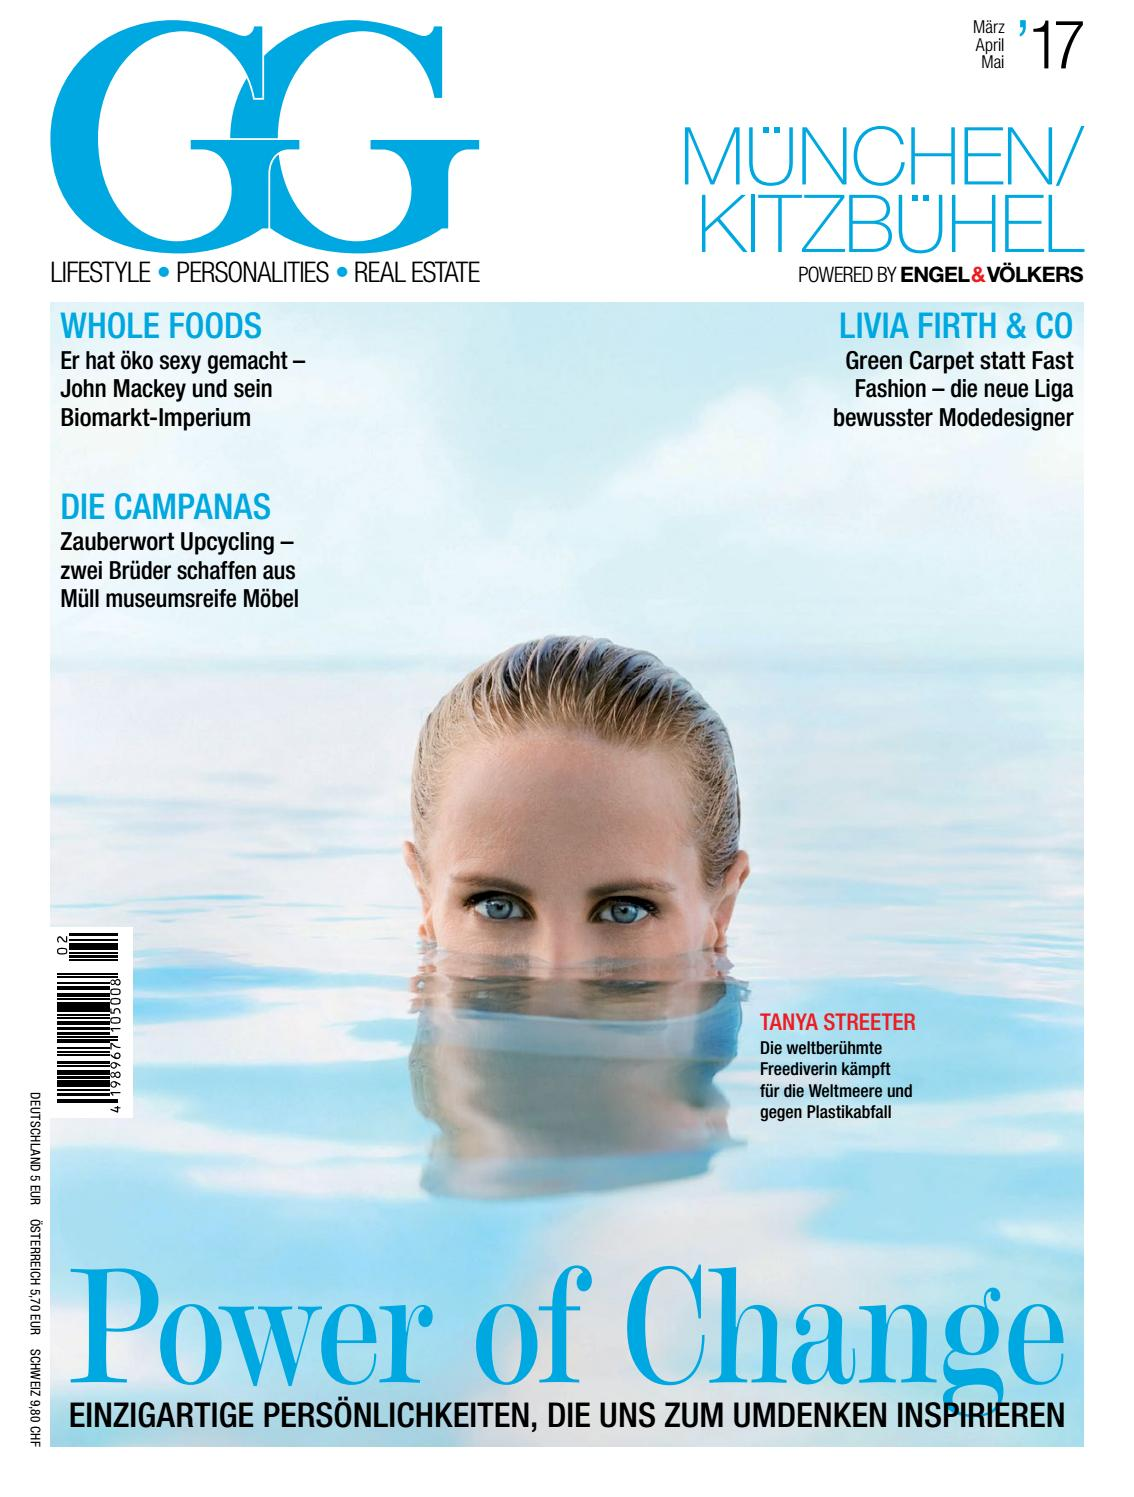 GG Magazine 02/17 München/Kitzbühel by GG-Magazine - issuu